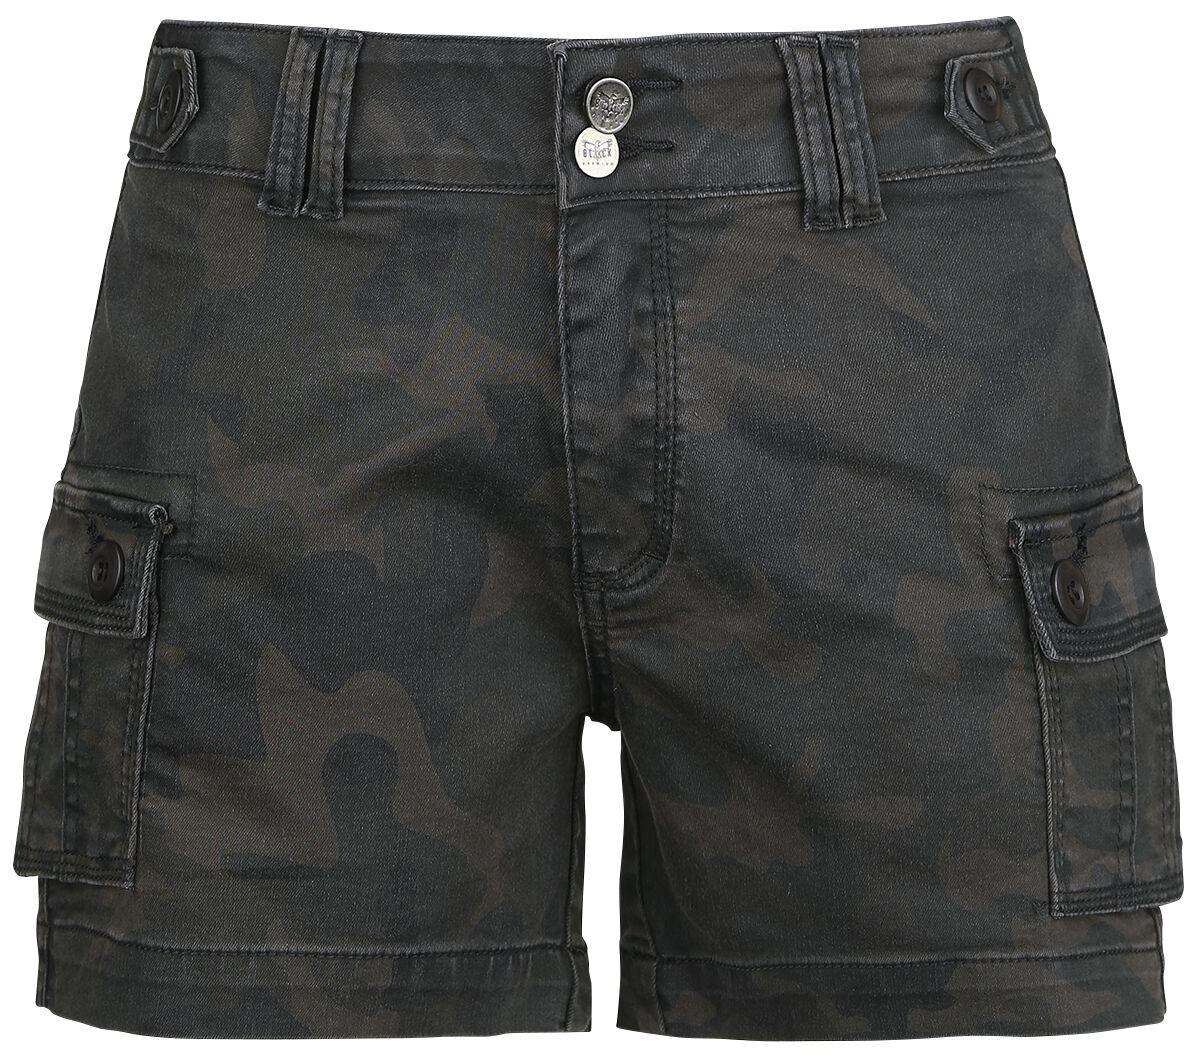 Black Premium by EMP Work 'N' Play Shorts camouflage